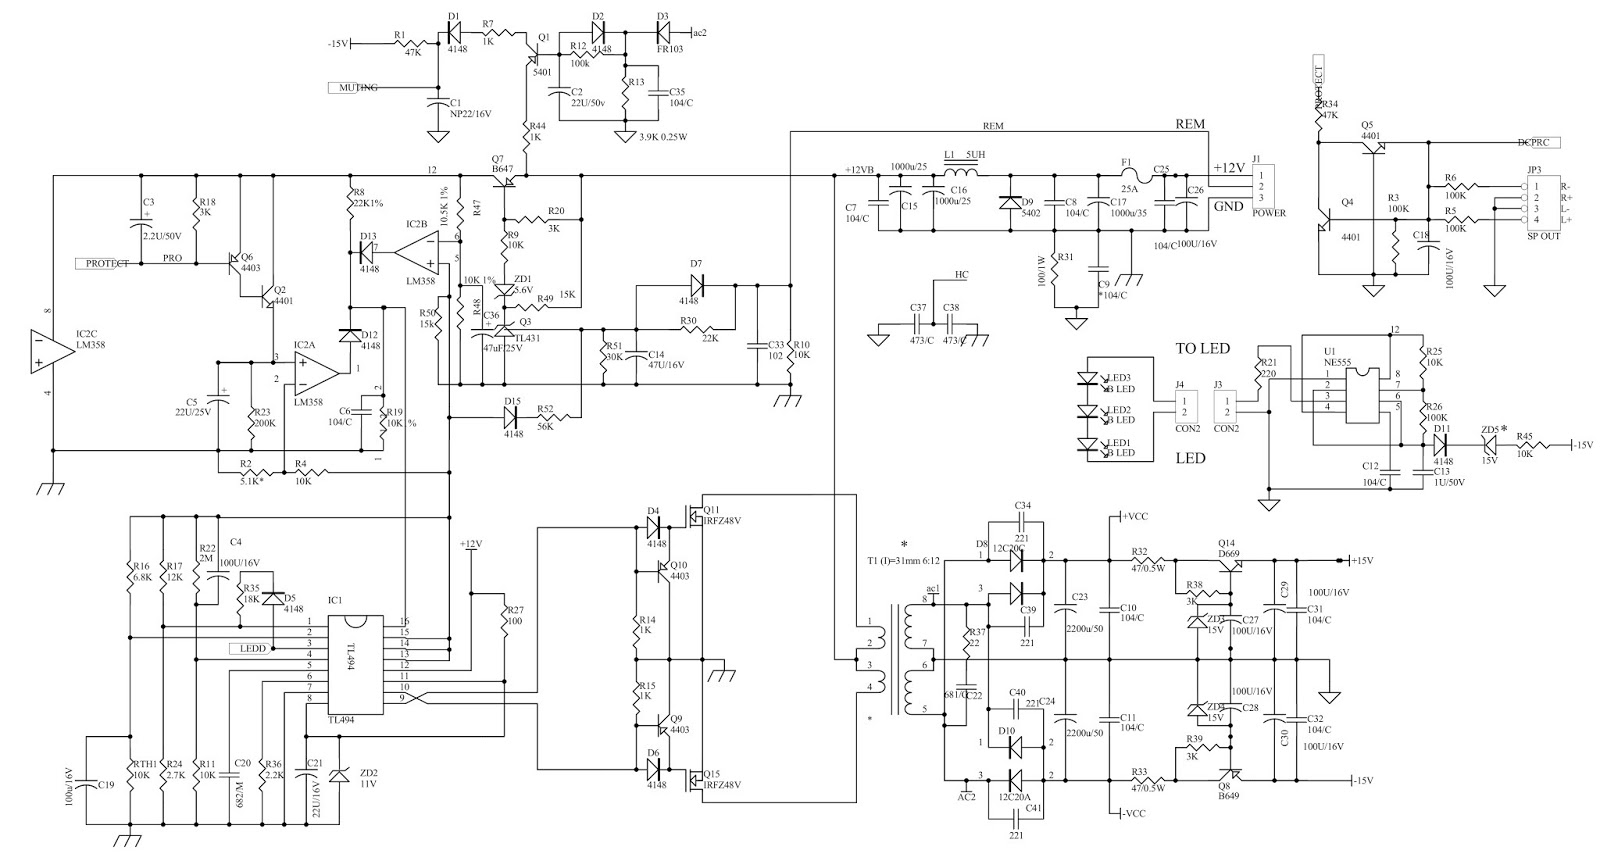 medium resolution of 4x12 speaker cabinet wiring diagrams free download wiring diagrams kitchen cabinet diagrams plans free download unhealthy02ihp